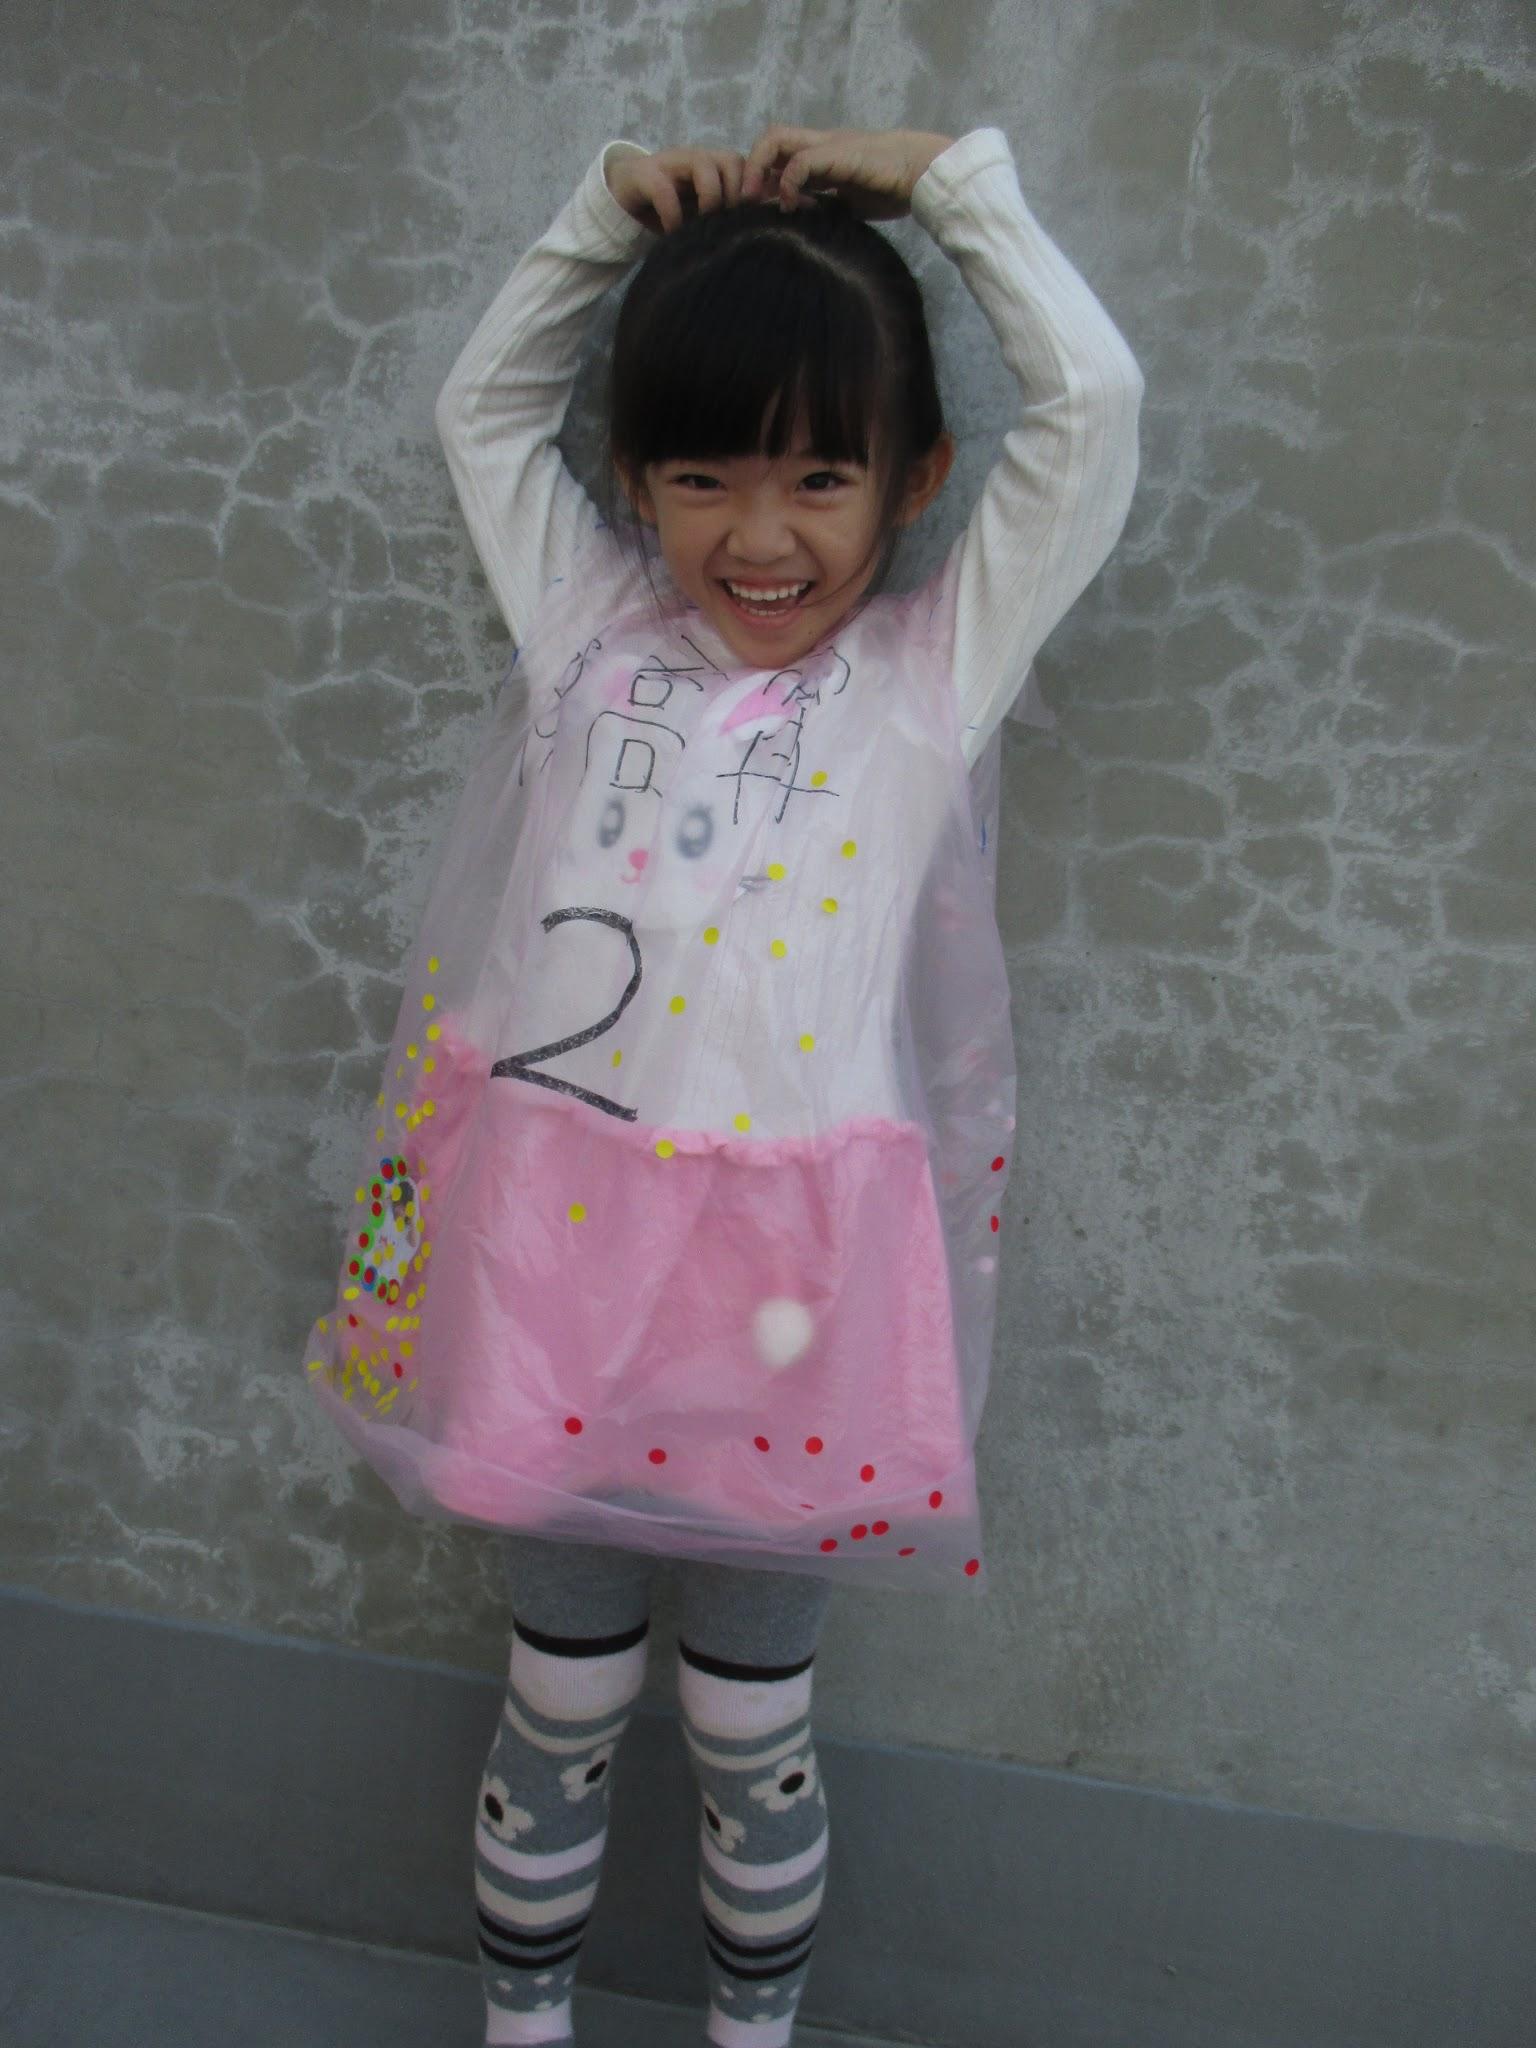 【U-5】幼稚園児・保育園児アイドル総合スレPART14 [転載禁止]©2ch.netYouTube動画>29本 ->画像>825枚